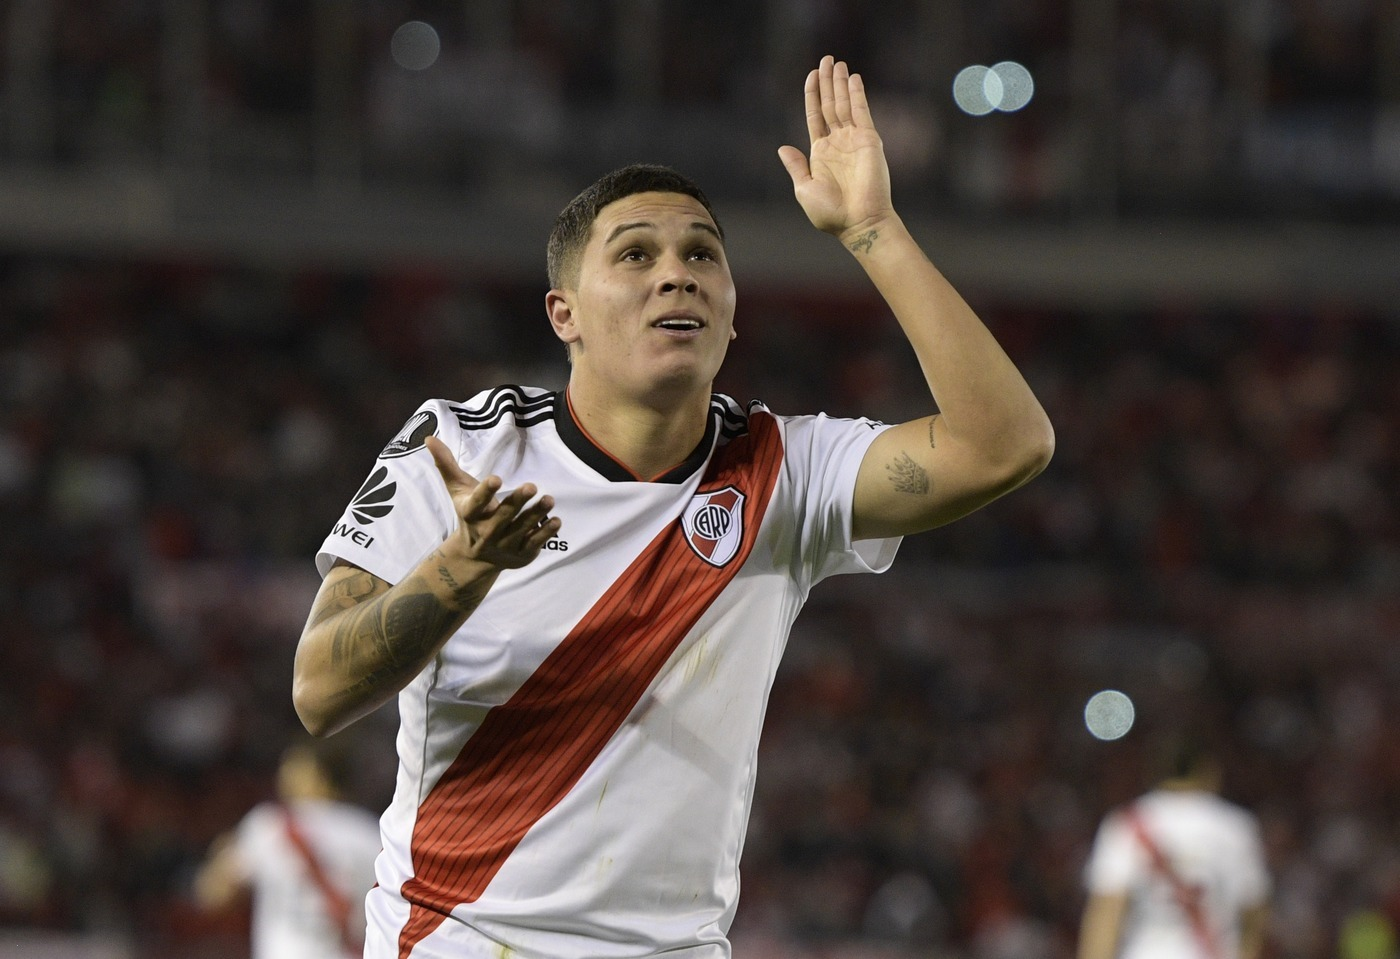 River Plate-Athletico Paranaense giovedì 30 maggio